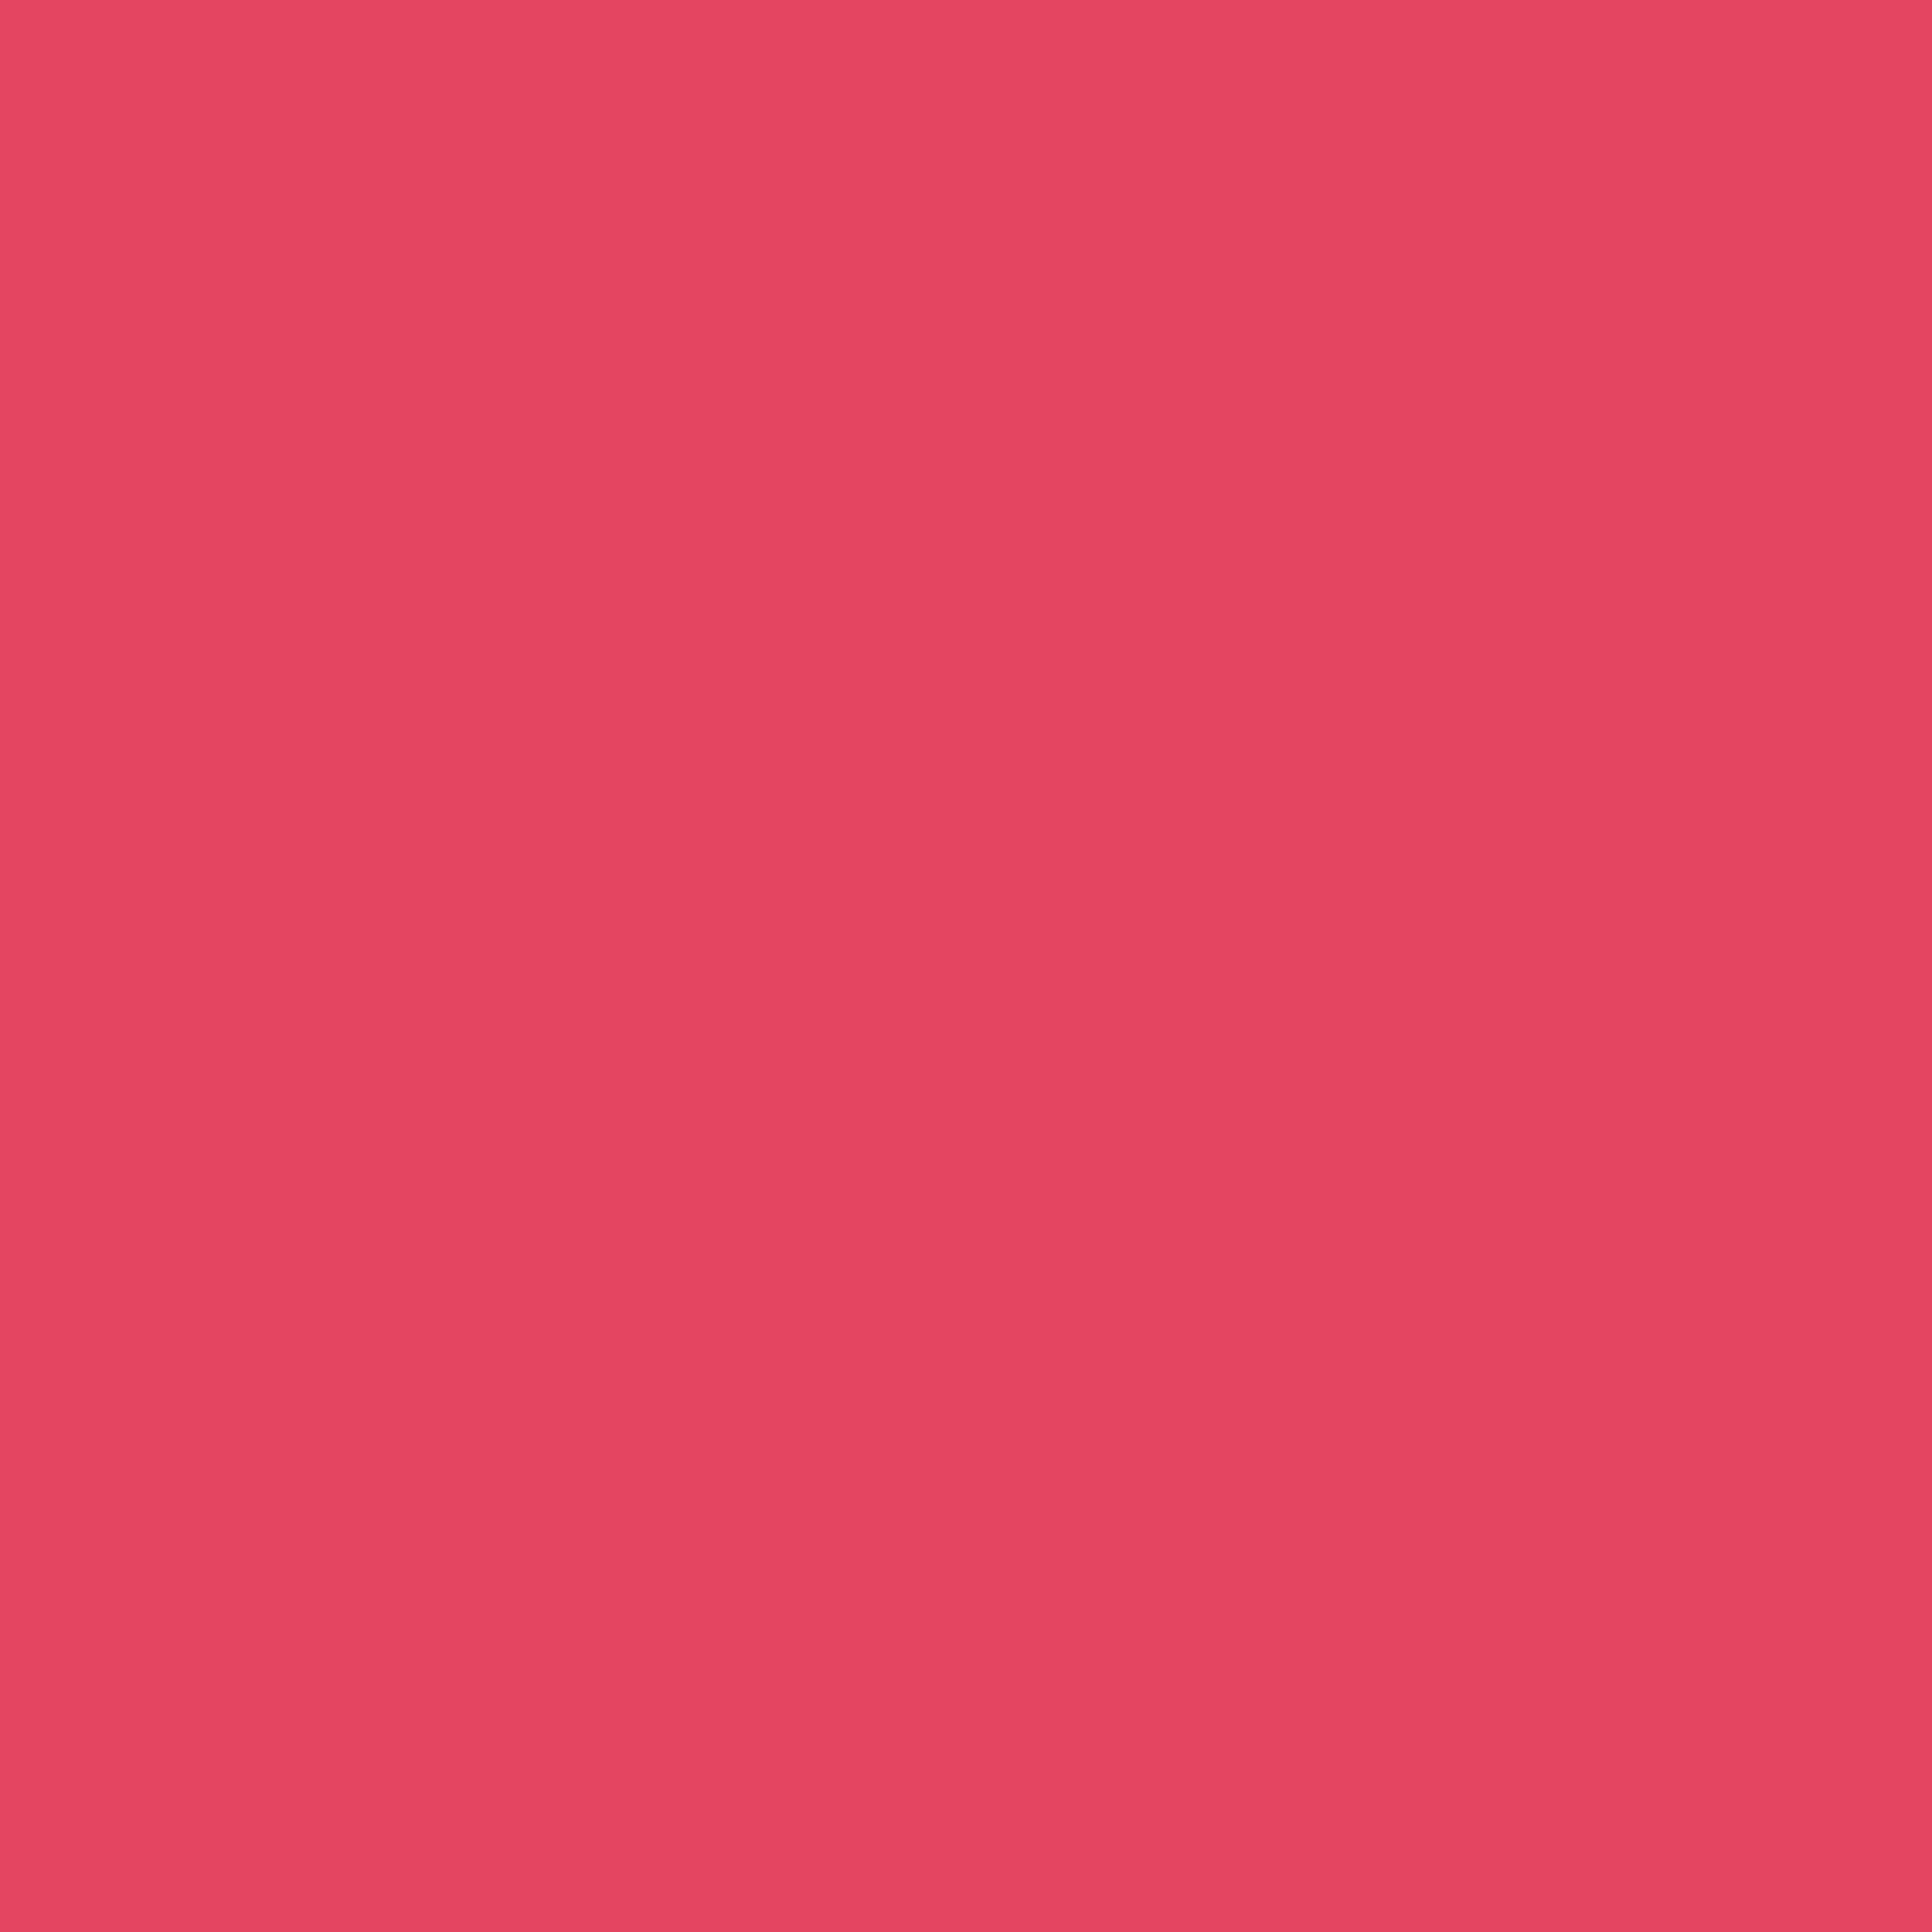 Viscosport Pink